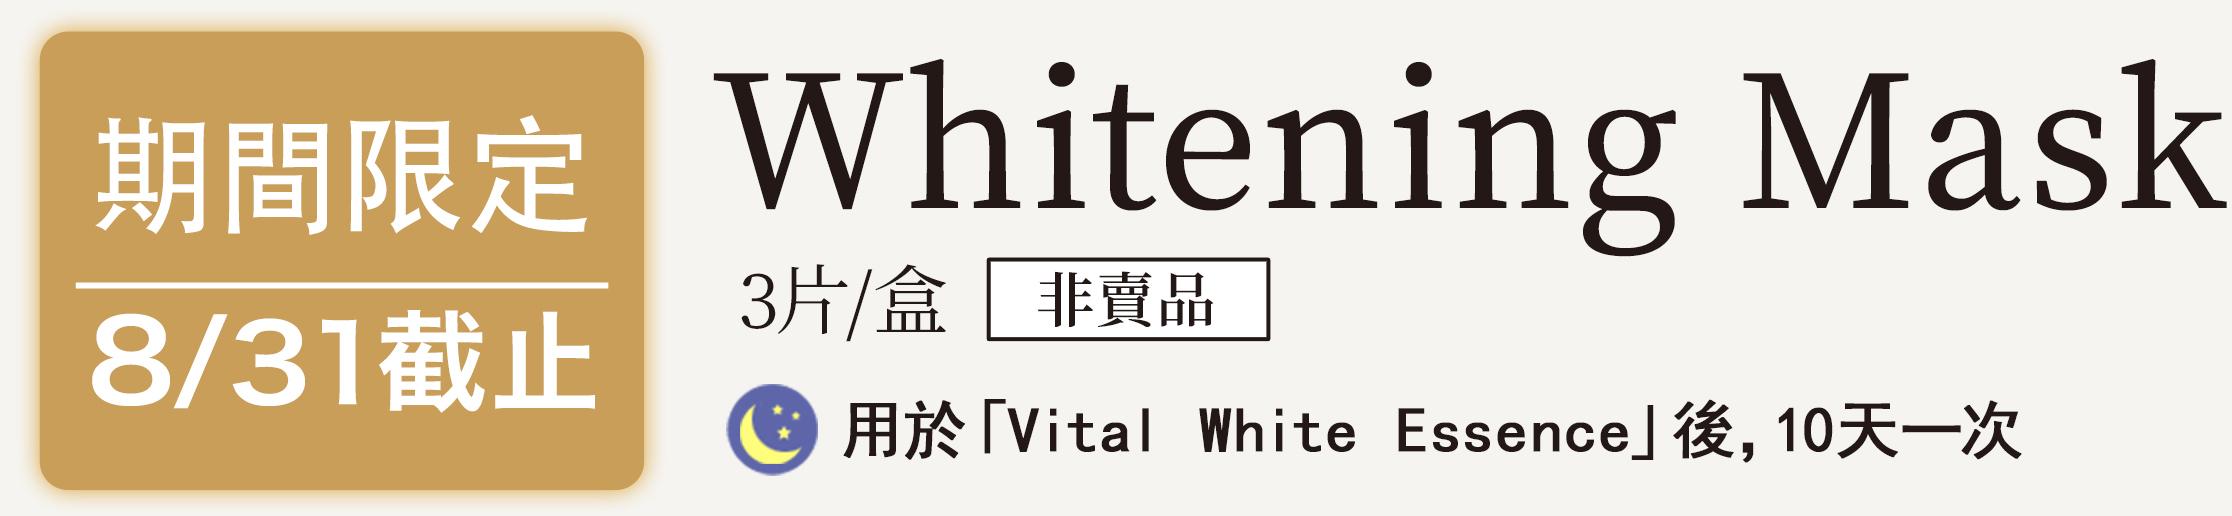 Whitening Mask 3片/盒 非賣品 用於「Vital White Essence」後,10天一次 期間限定 8/31截止